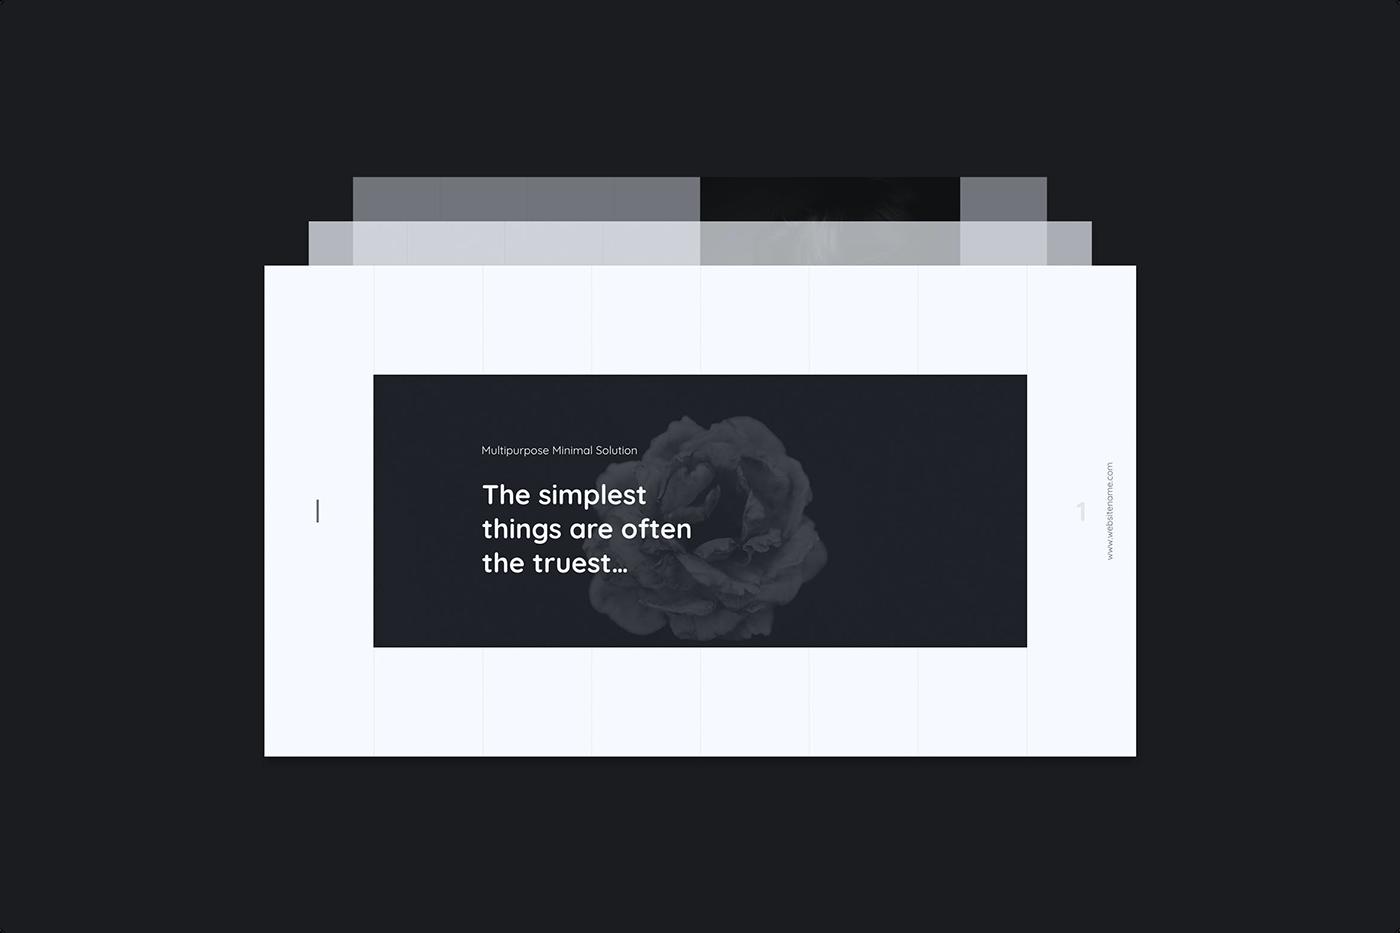 Notify - Animated & Creative Presentation Template (KEY) - 6